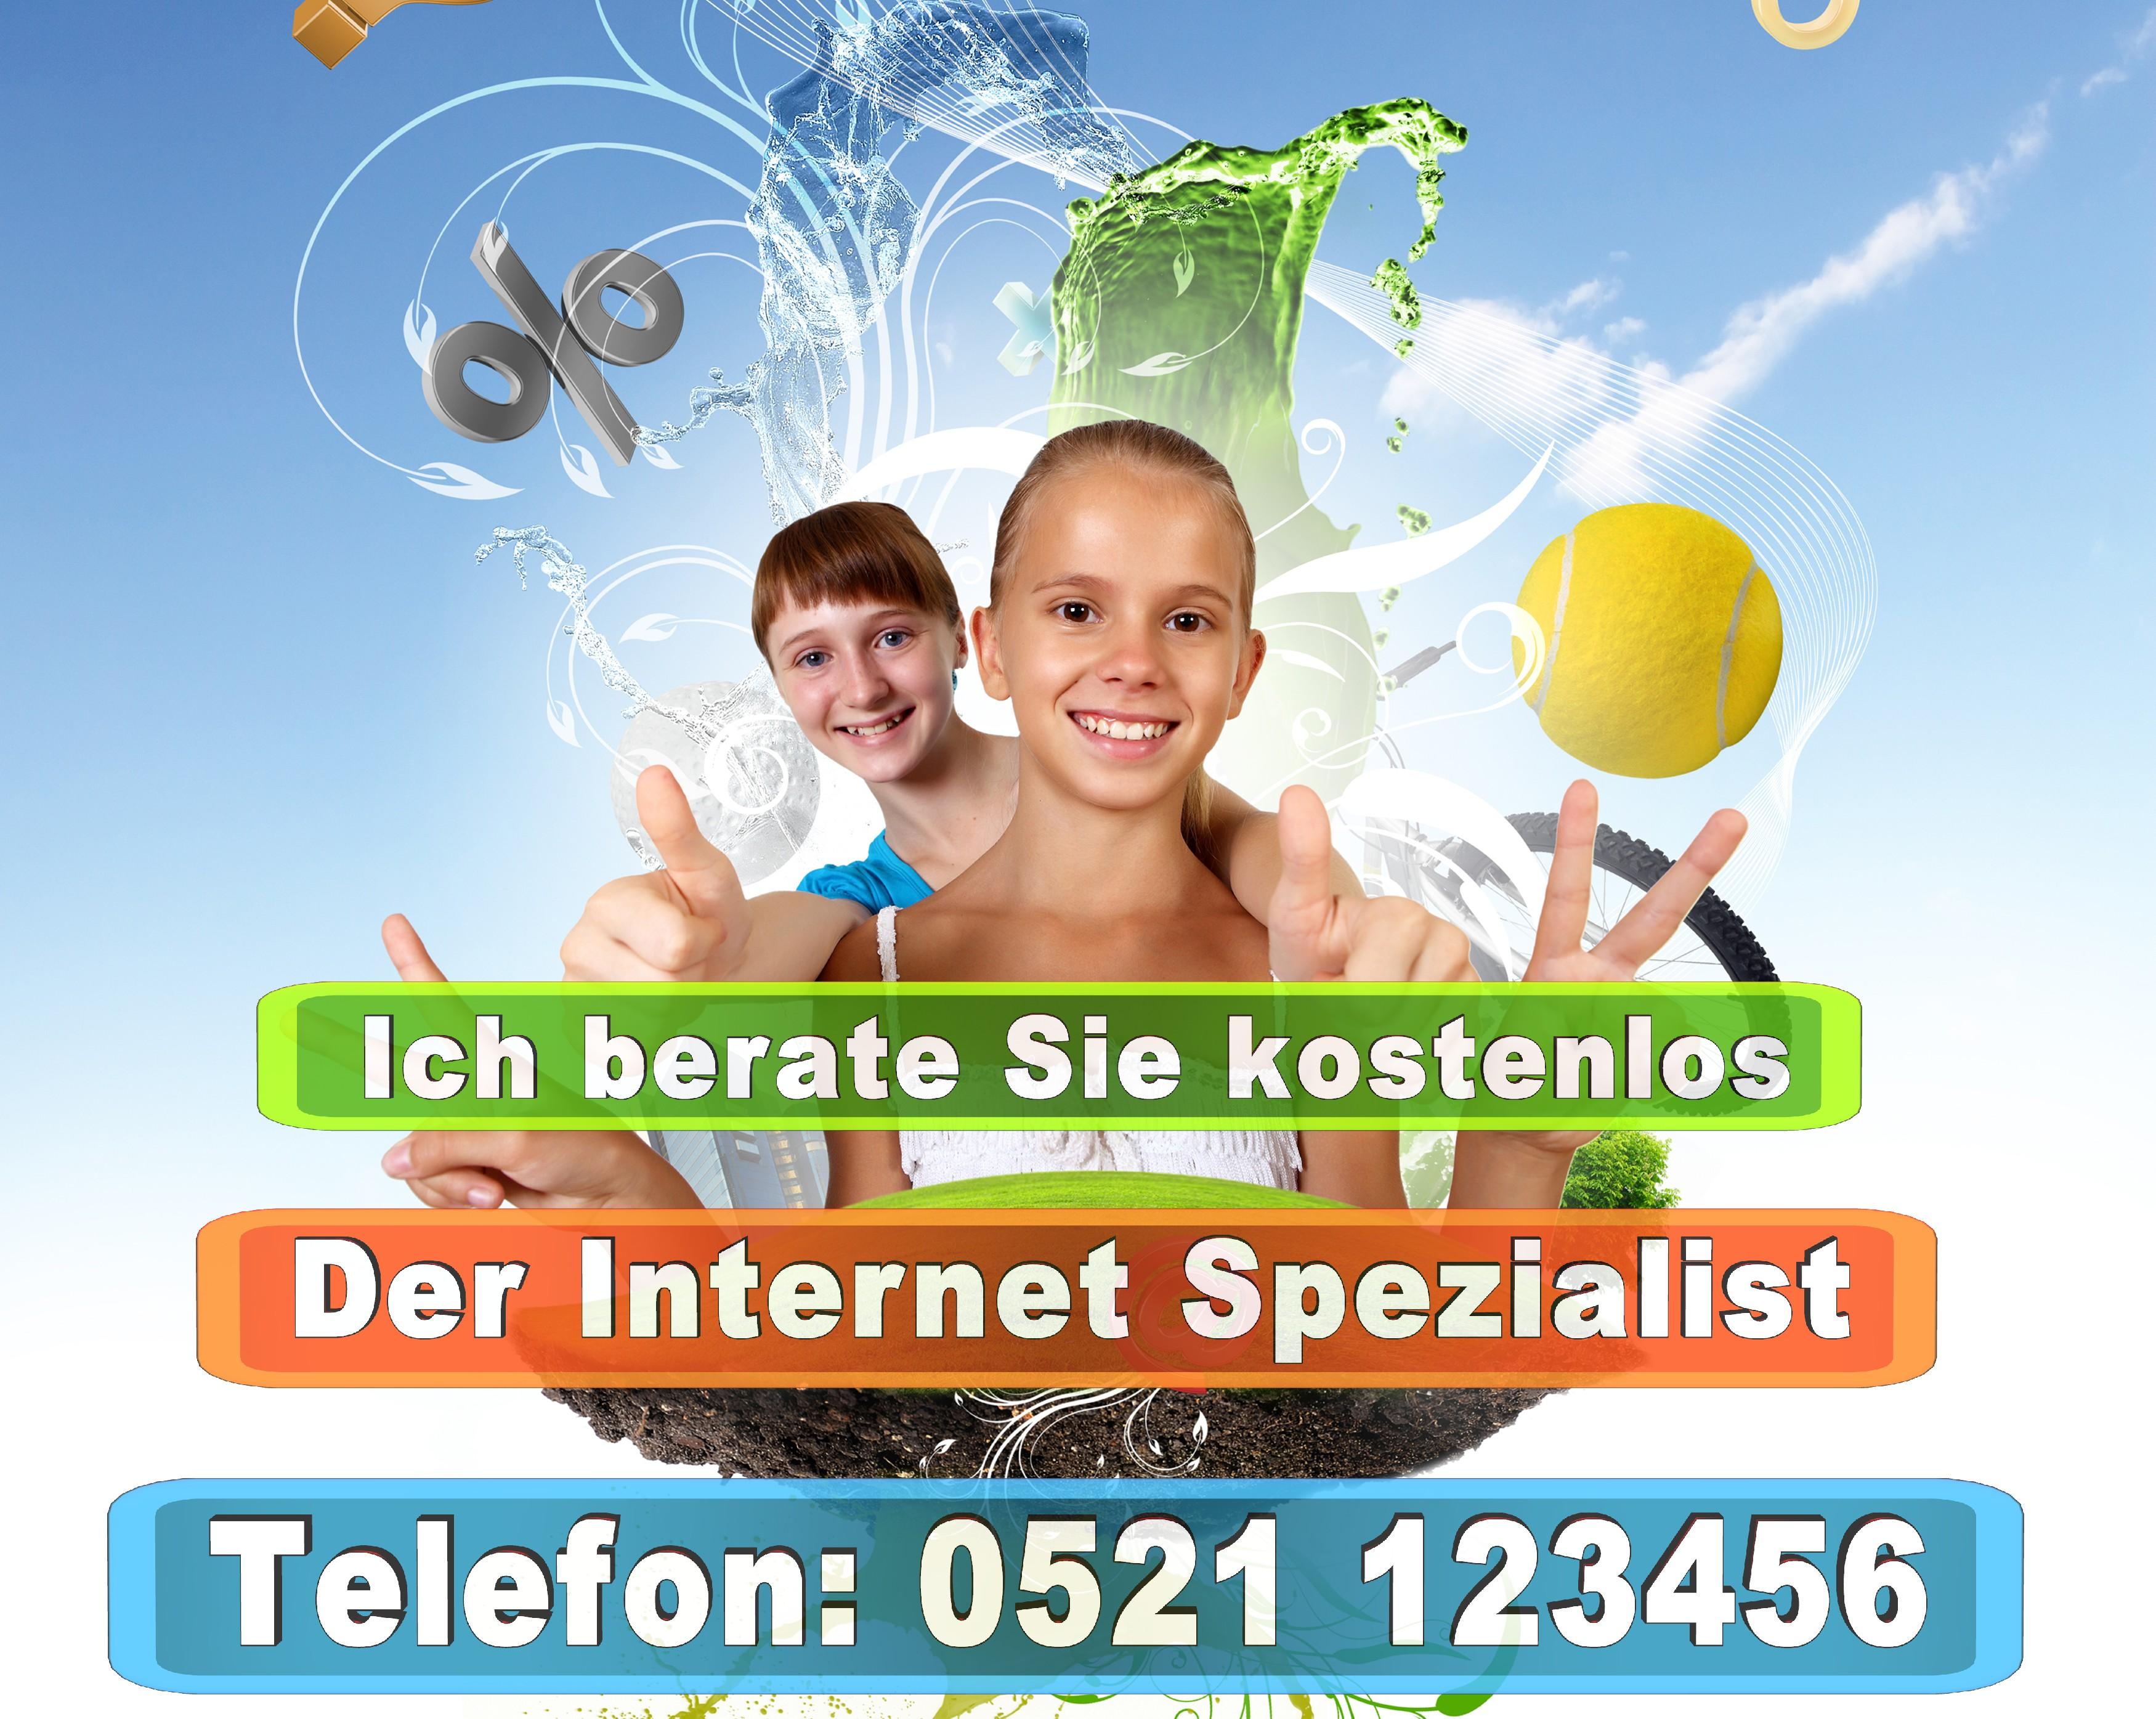 Schulen Bielefeld Schule Grundschule Sonderschule Hauptschule Realschule Schulhof Turnhalle Sporthalle Bielefeld NRW (4)